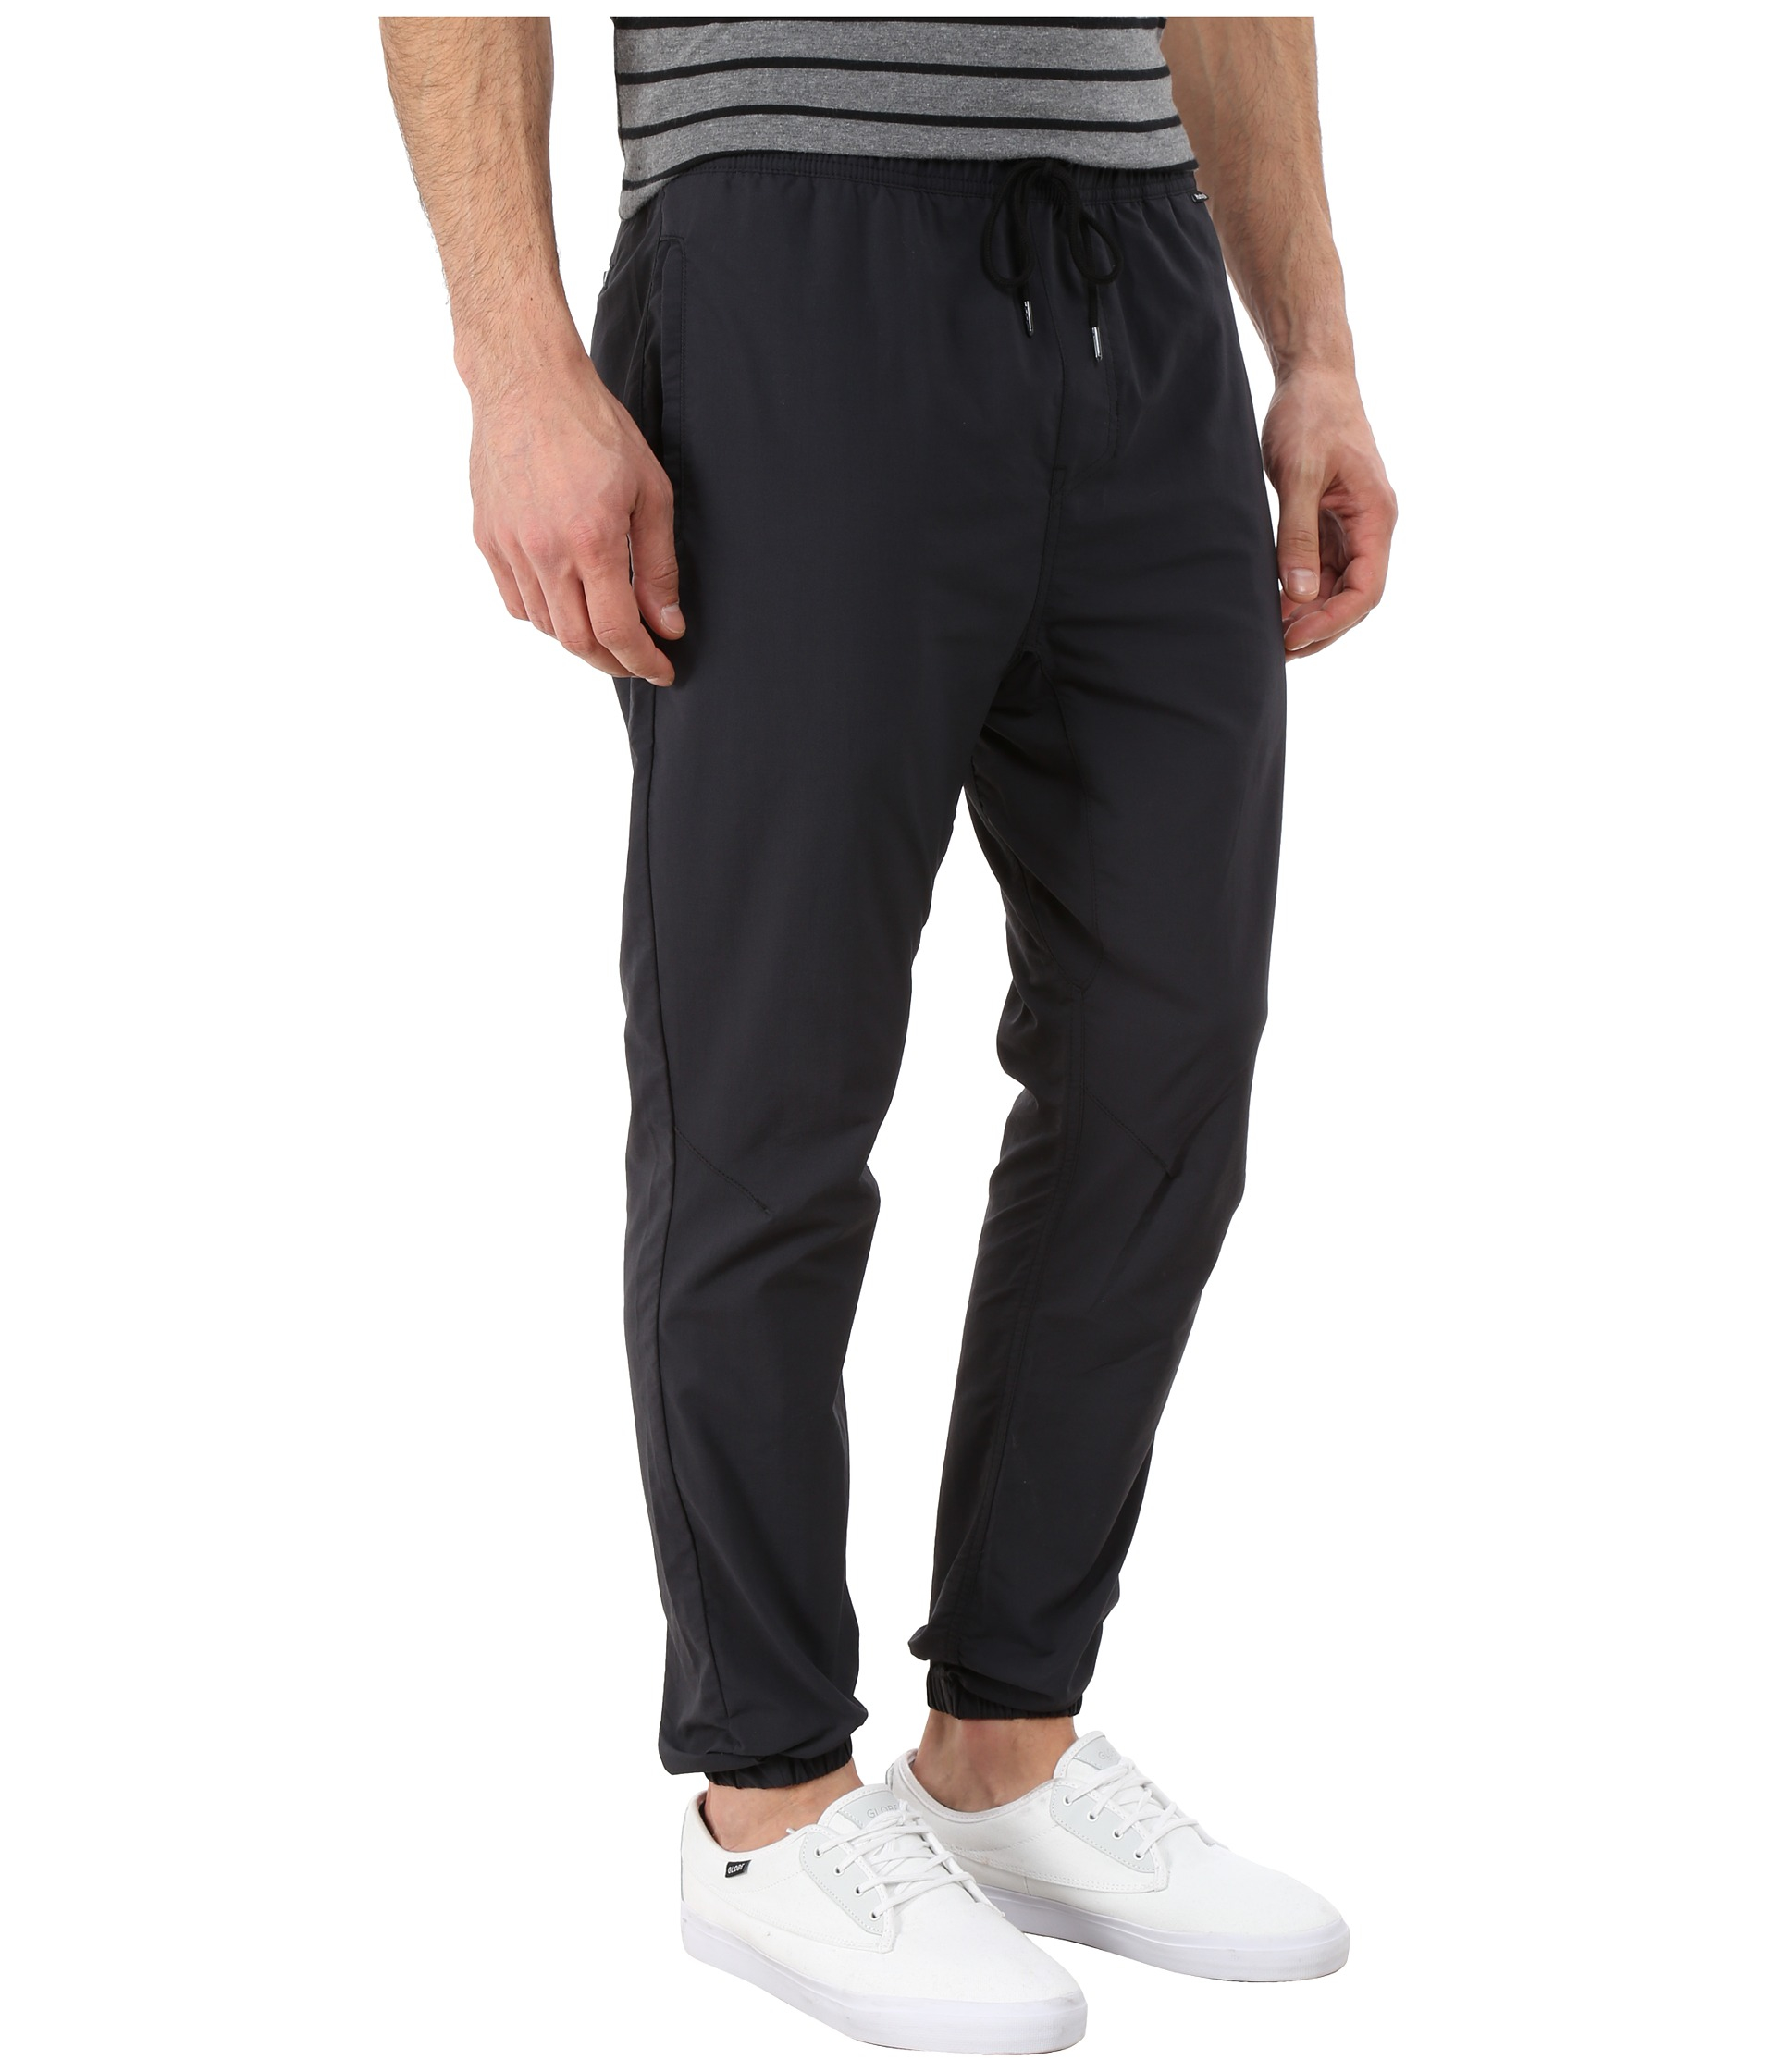 0d2fad300b1 Hurley Dri-fit Drifter Jogger in Black for Men - Lyst